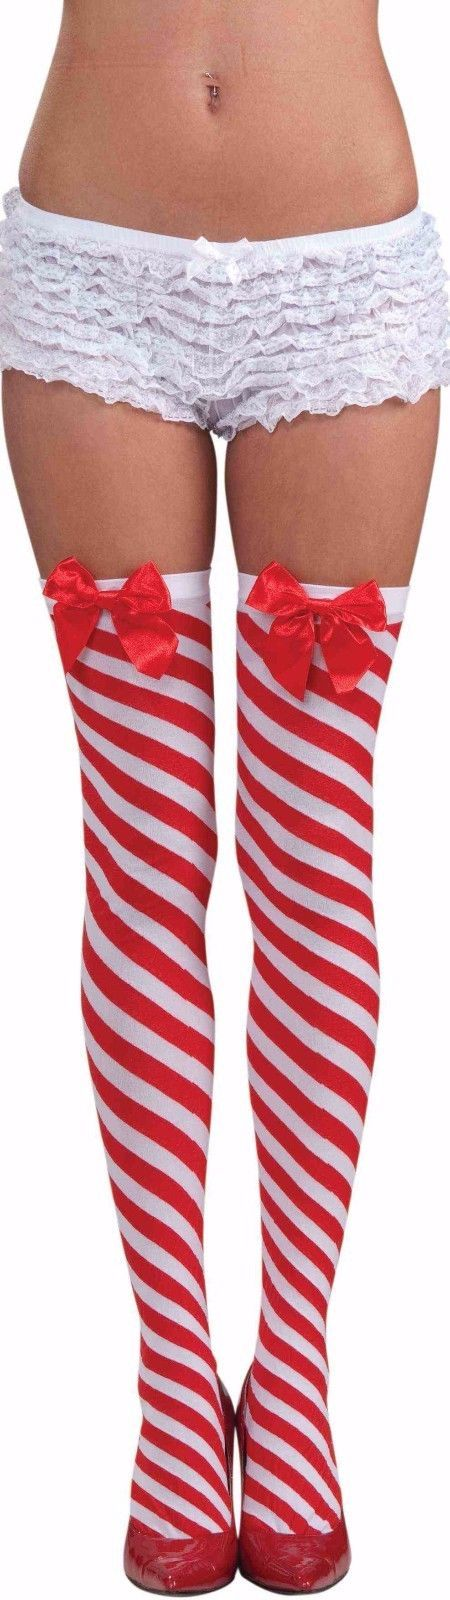 ae5a2dea5e37c $10.41 - Candy Cane Striped Thigh High Stockings Bow Stripped Red White  Christmas Womens #ebay #Fashion